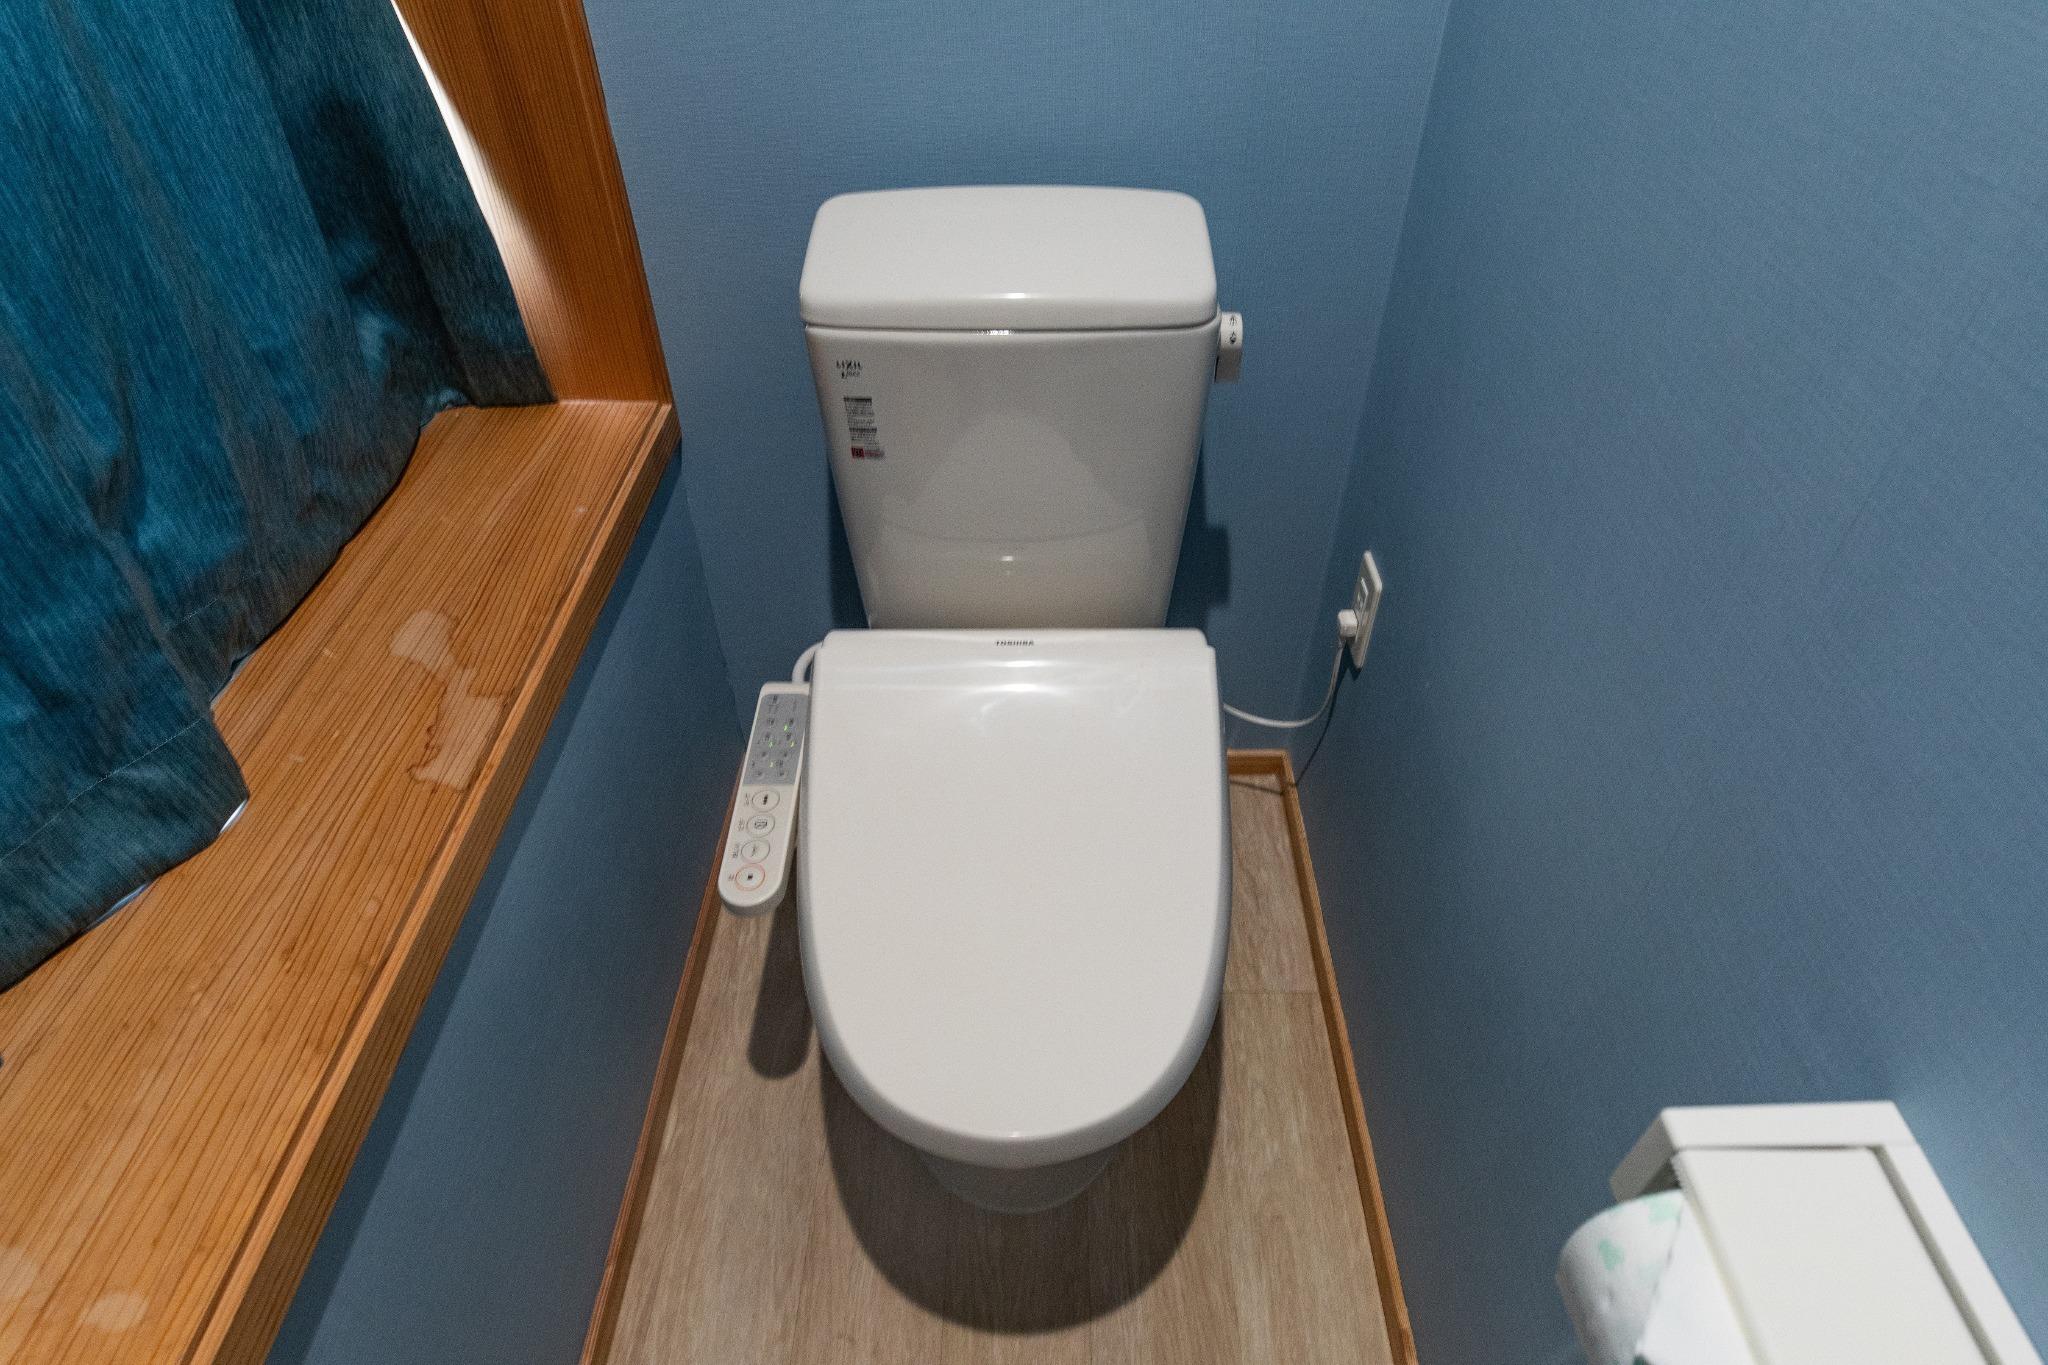 Bedroom 03 Toilet 寝室03 トイレ